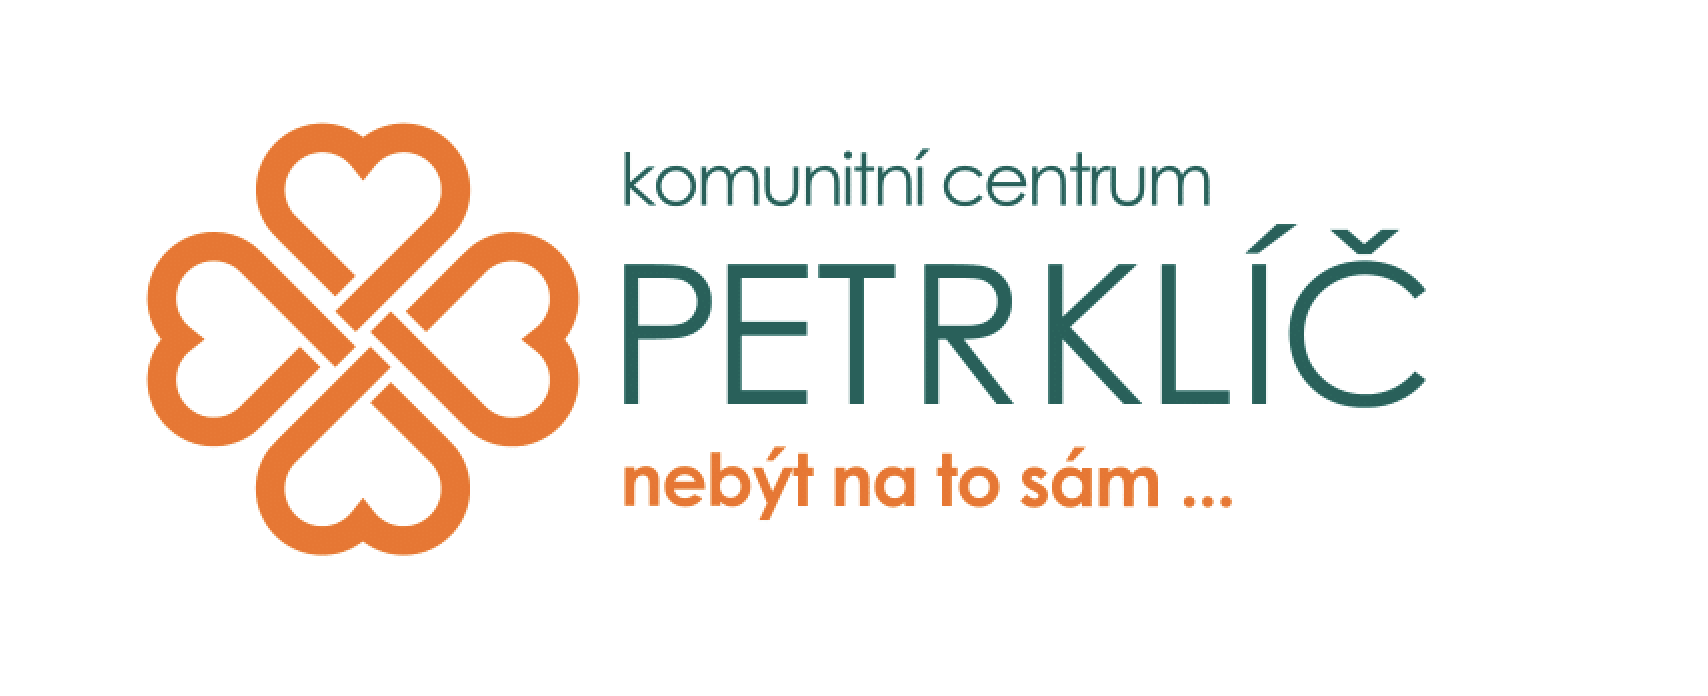 Komunitní centrum Petrklíč